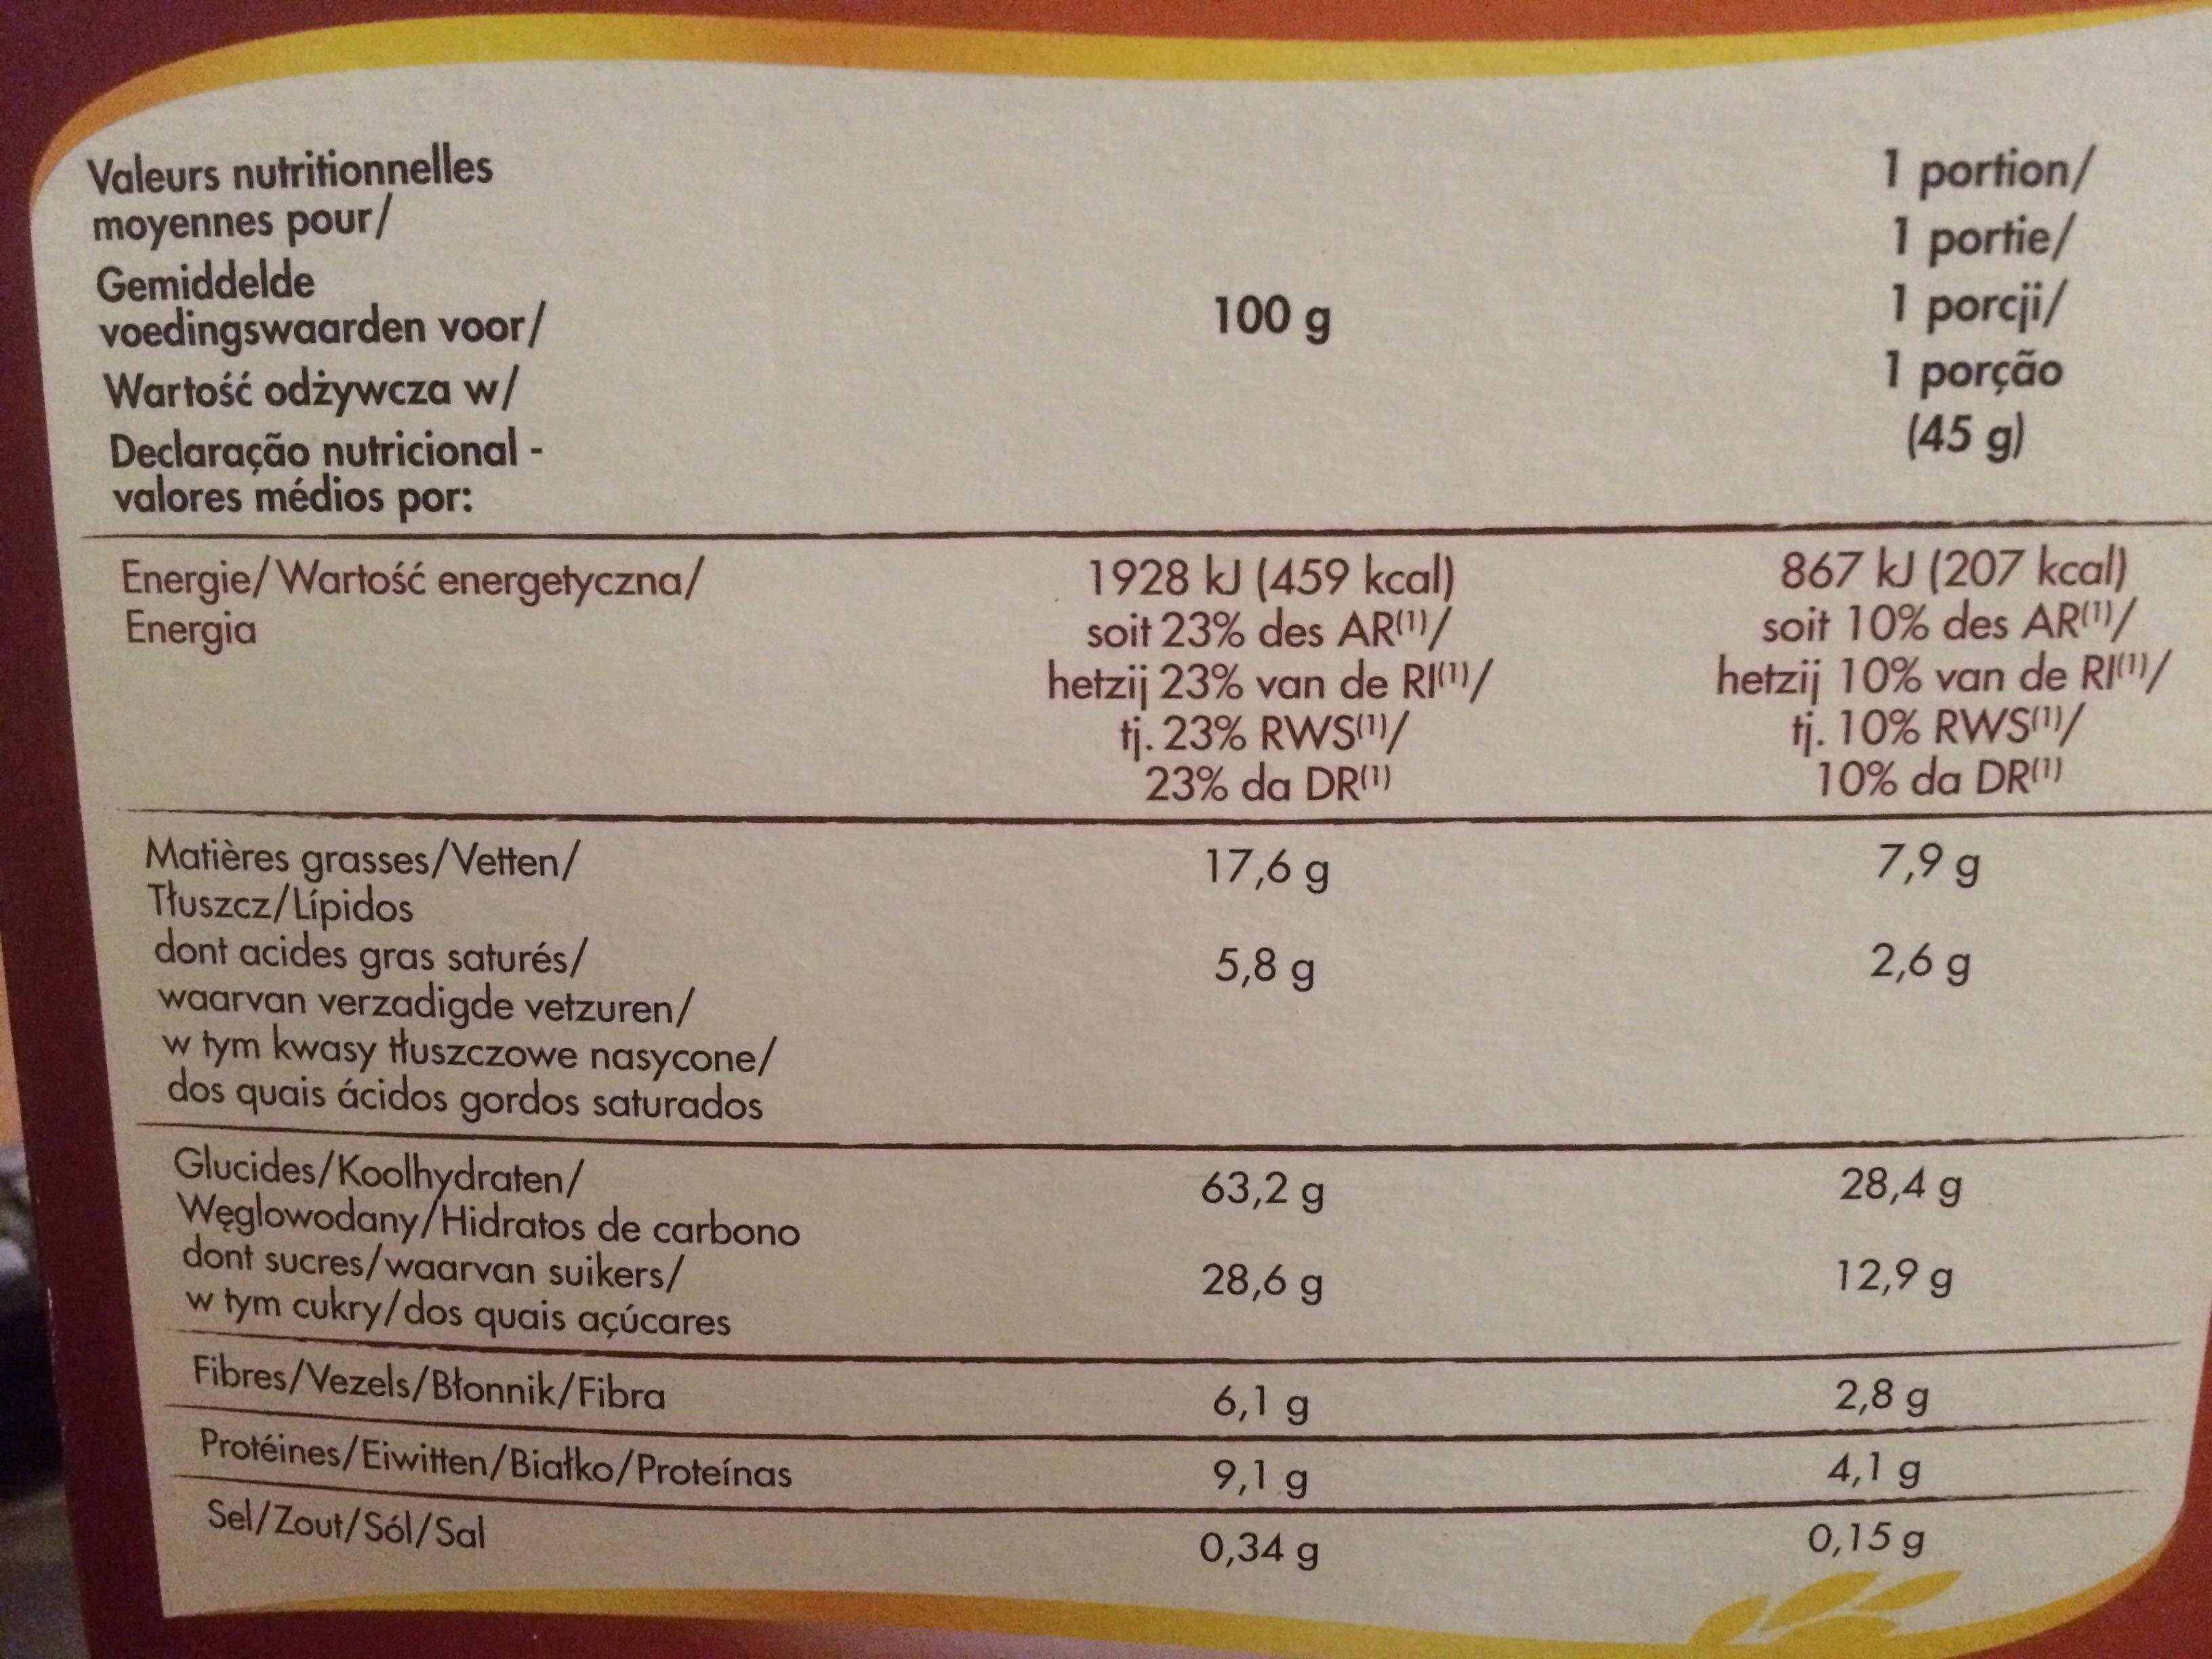 Crisp Muesli 2 Chocolats et Caramel - Informations nutritionnelles - fr